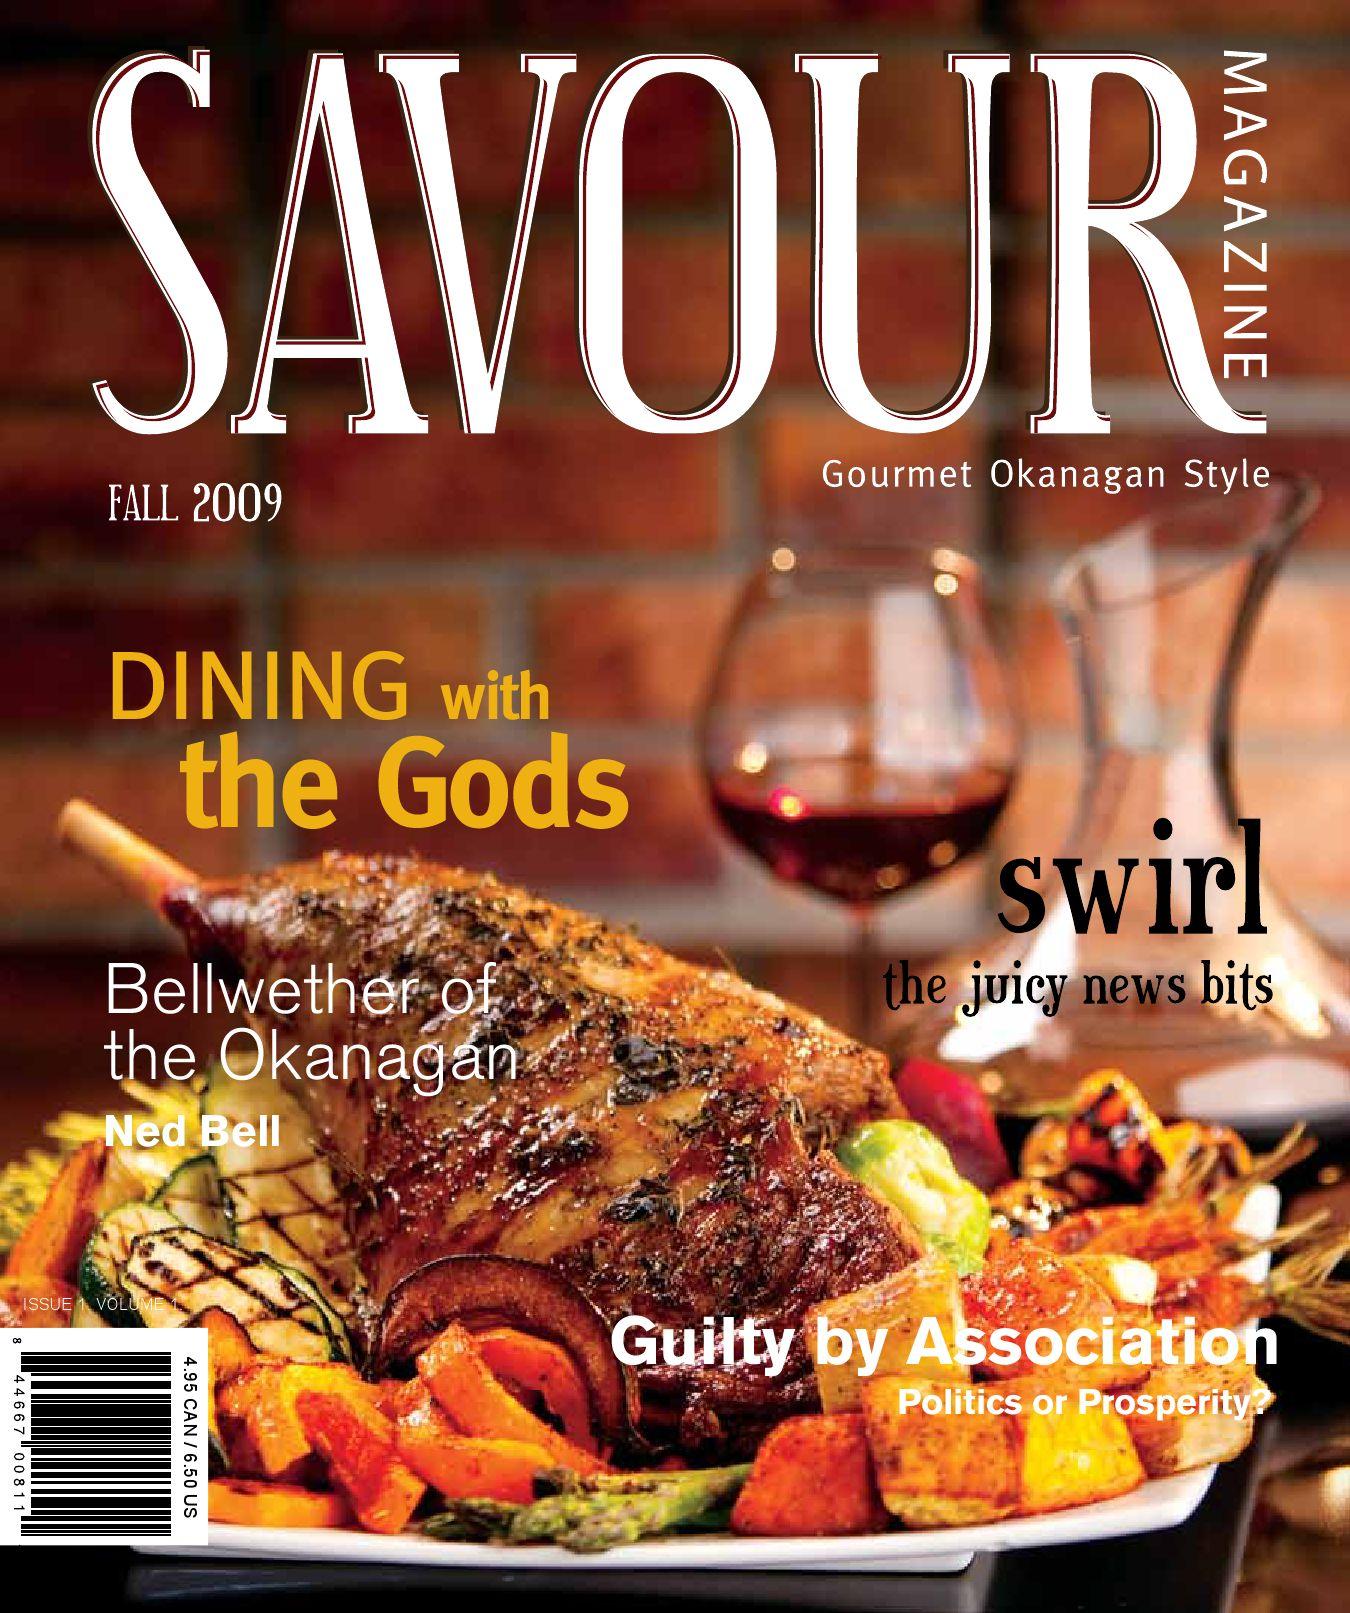 Savour Magazine Gourmet Okanagan Style By Niche Media Issuu